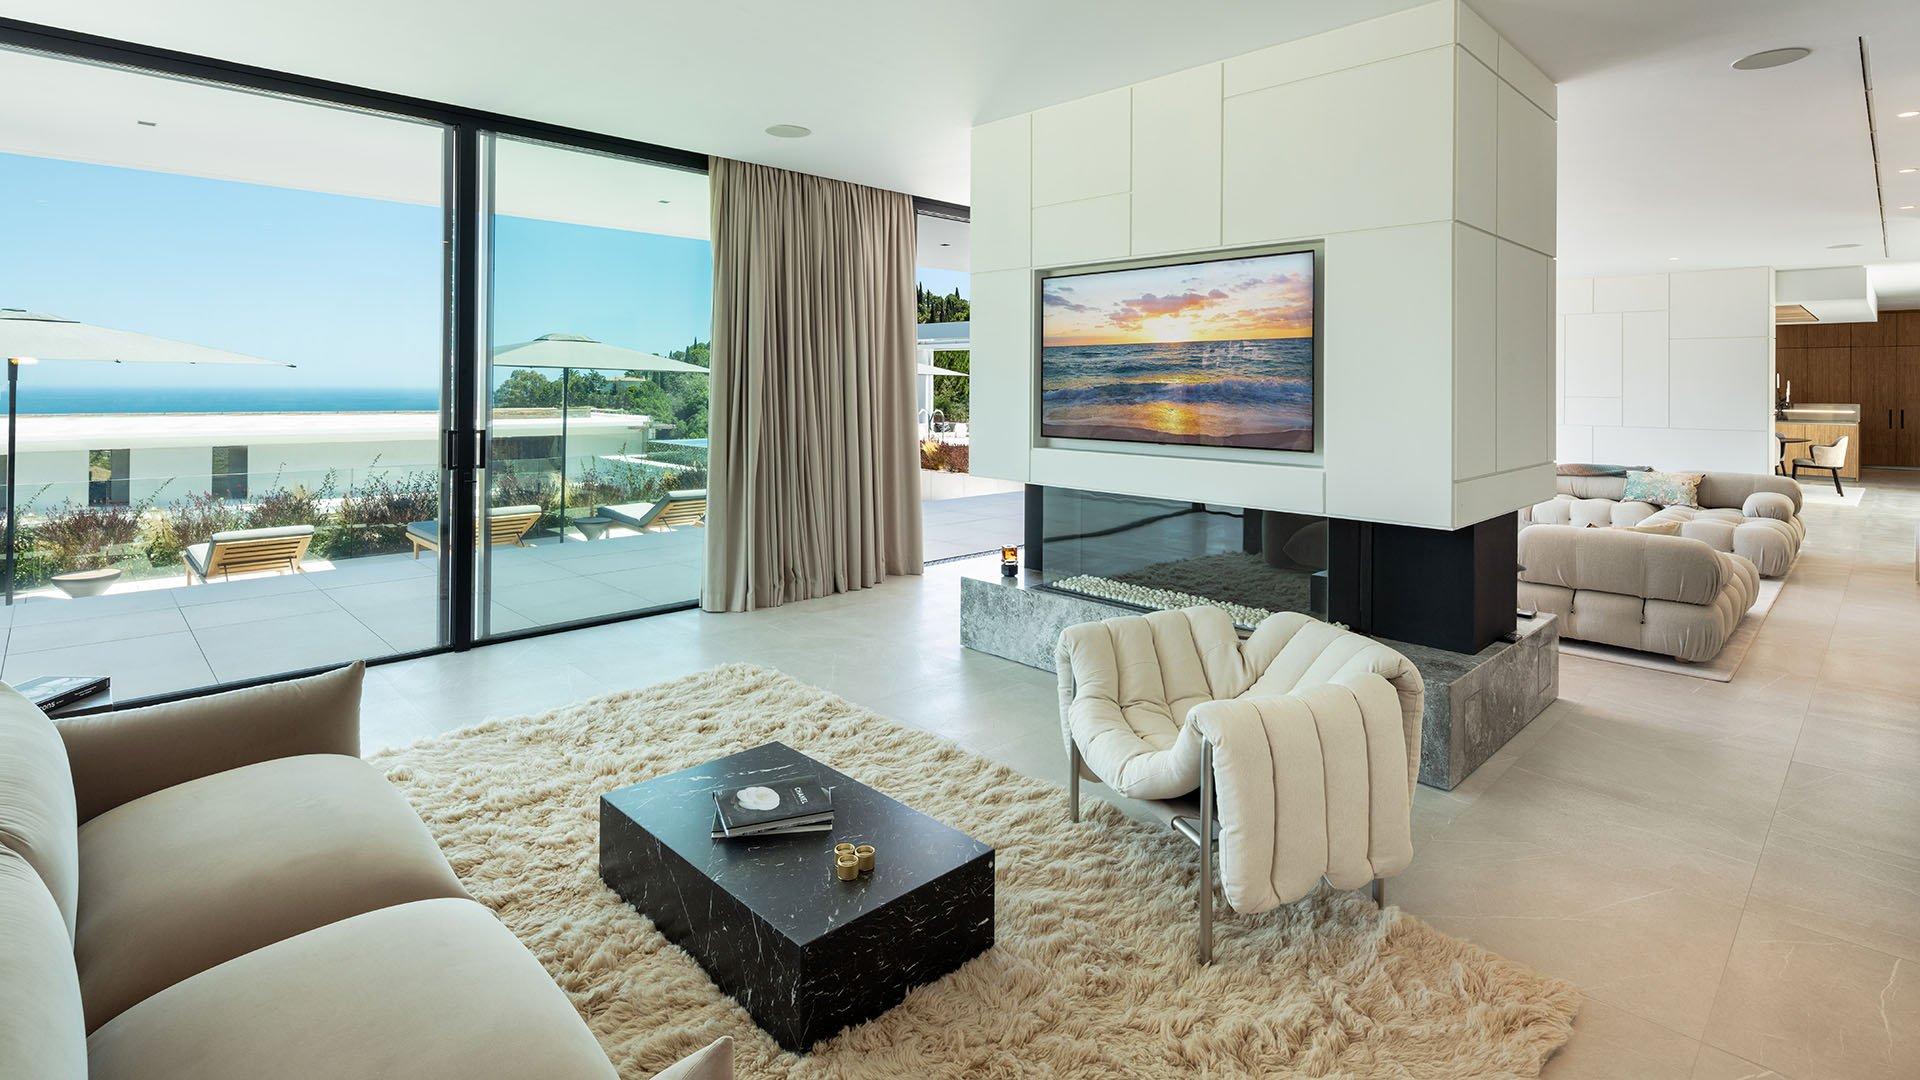 Villa Sienna: Sensational villa in Marbella surrounded by nature